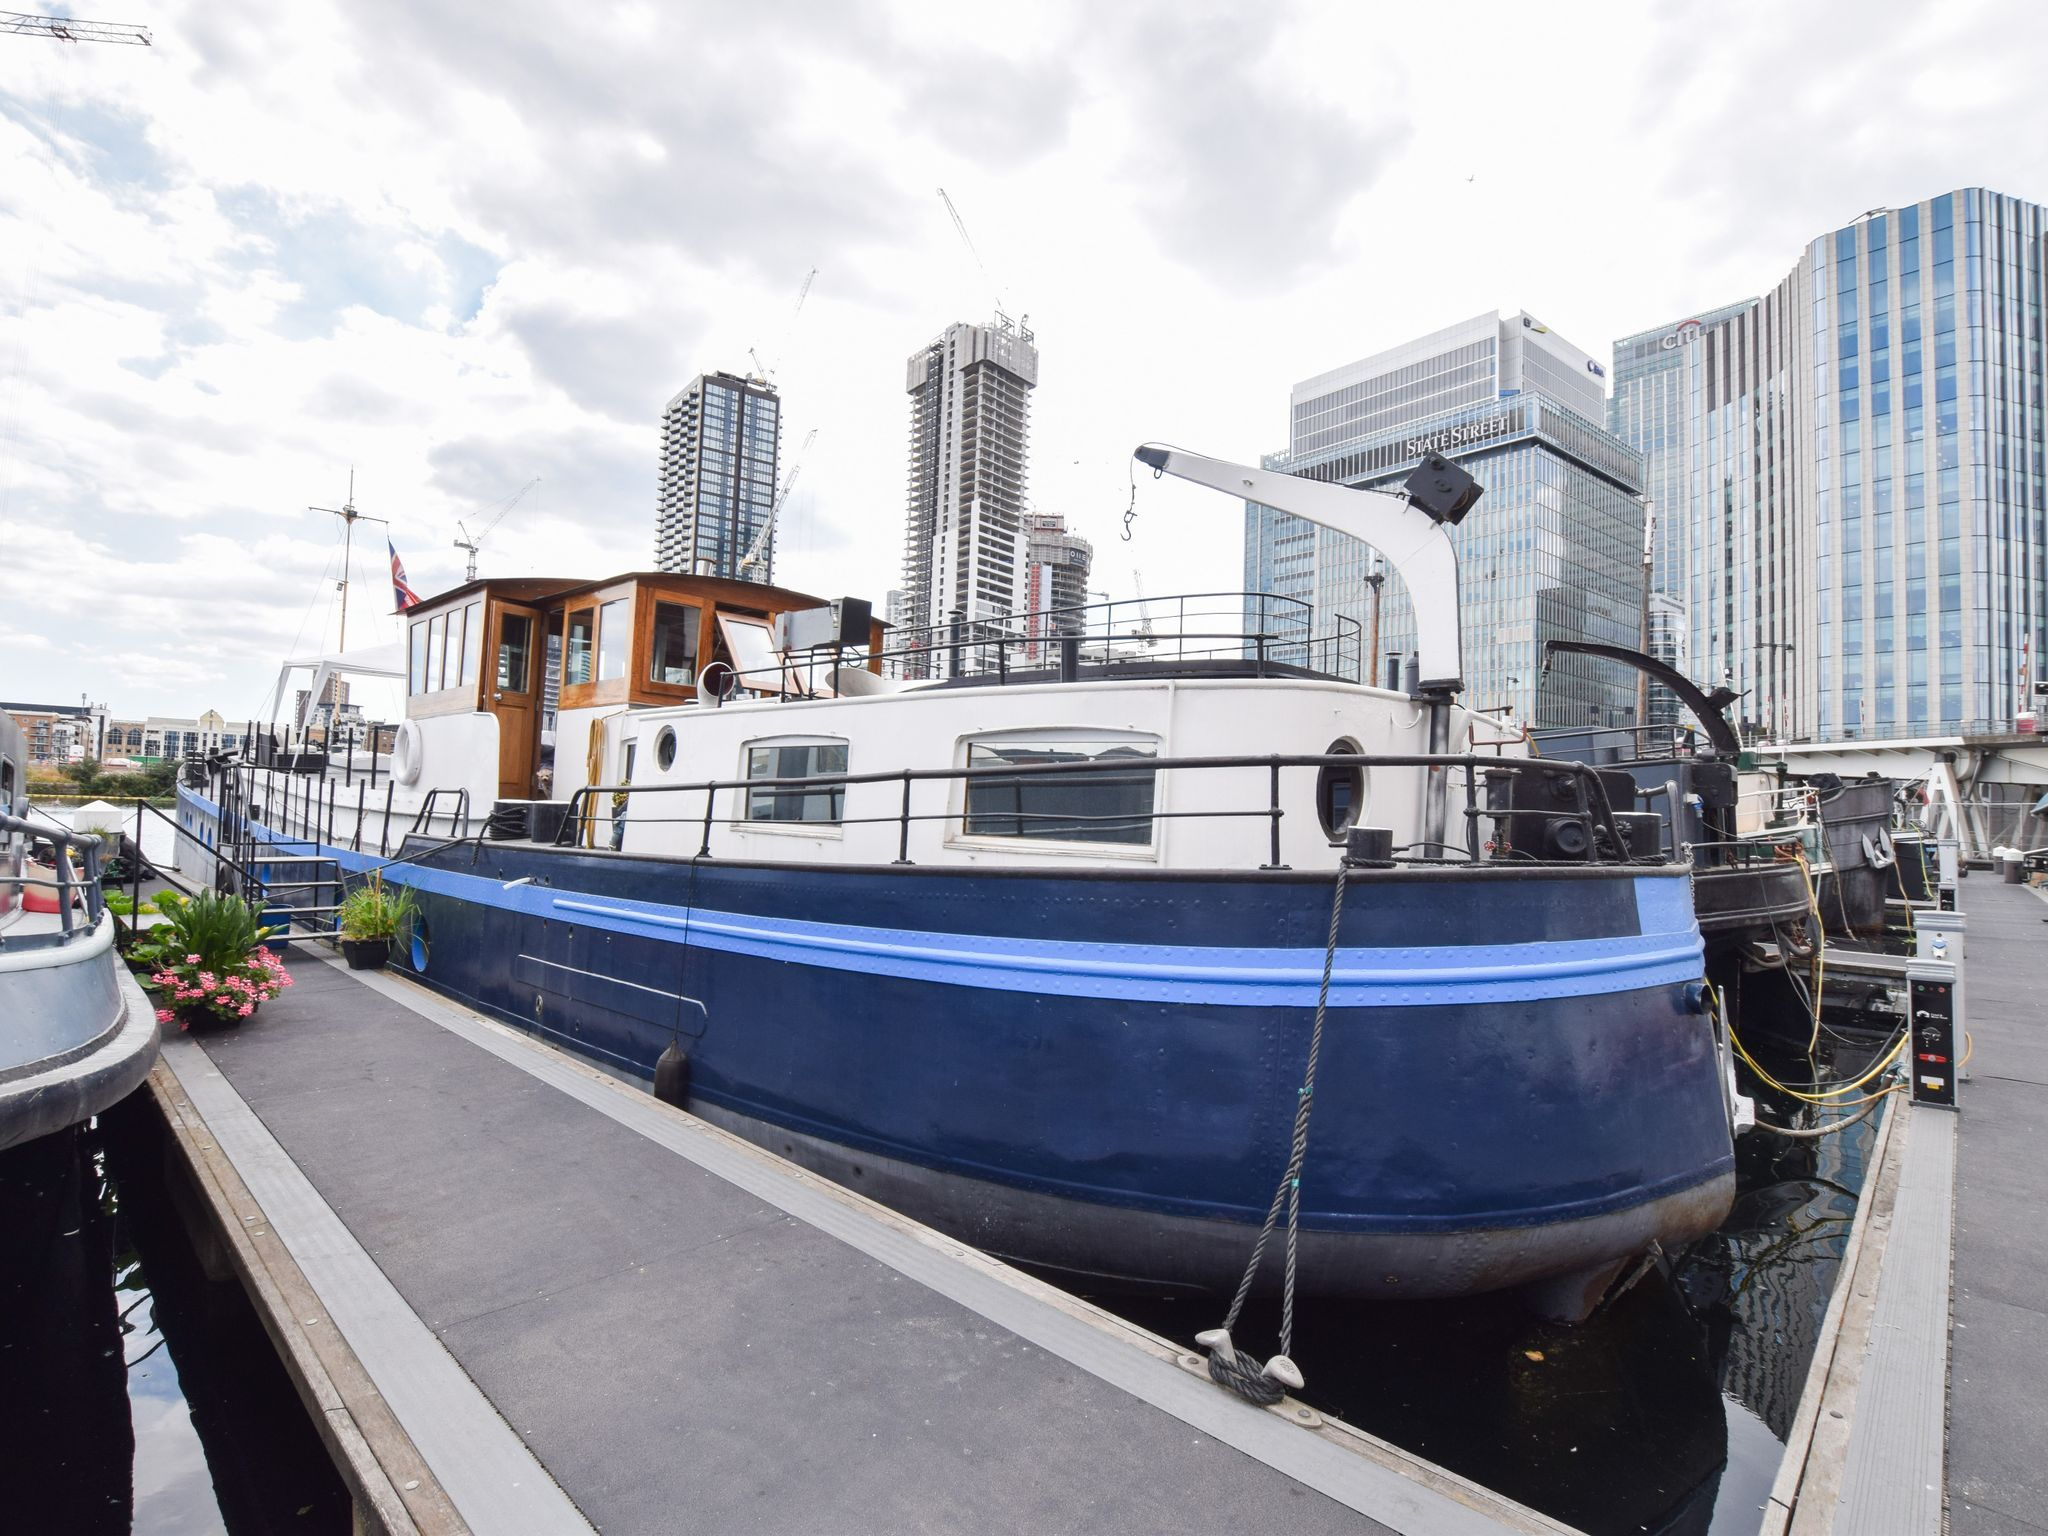 Belgian Spitz Barge 28m on London mooring